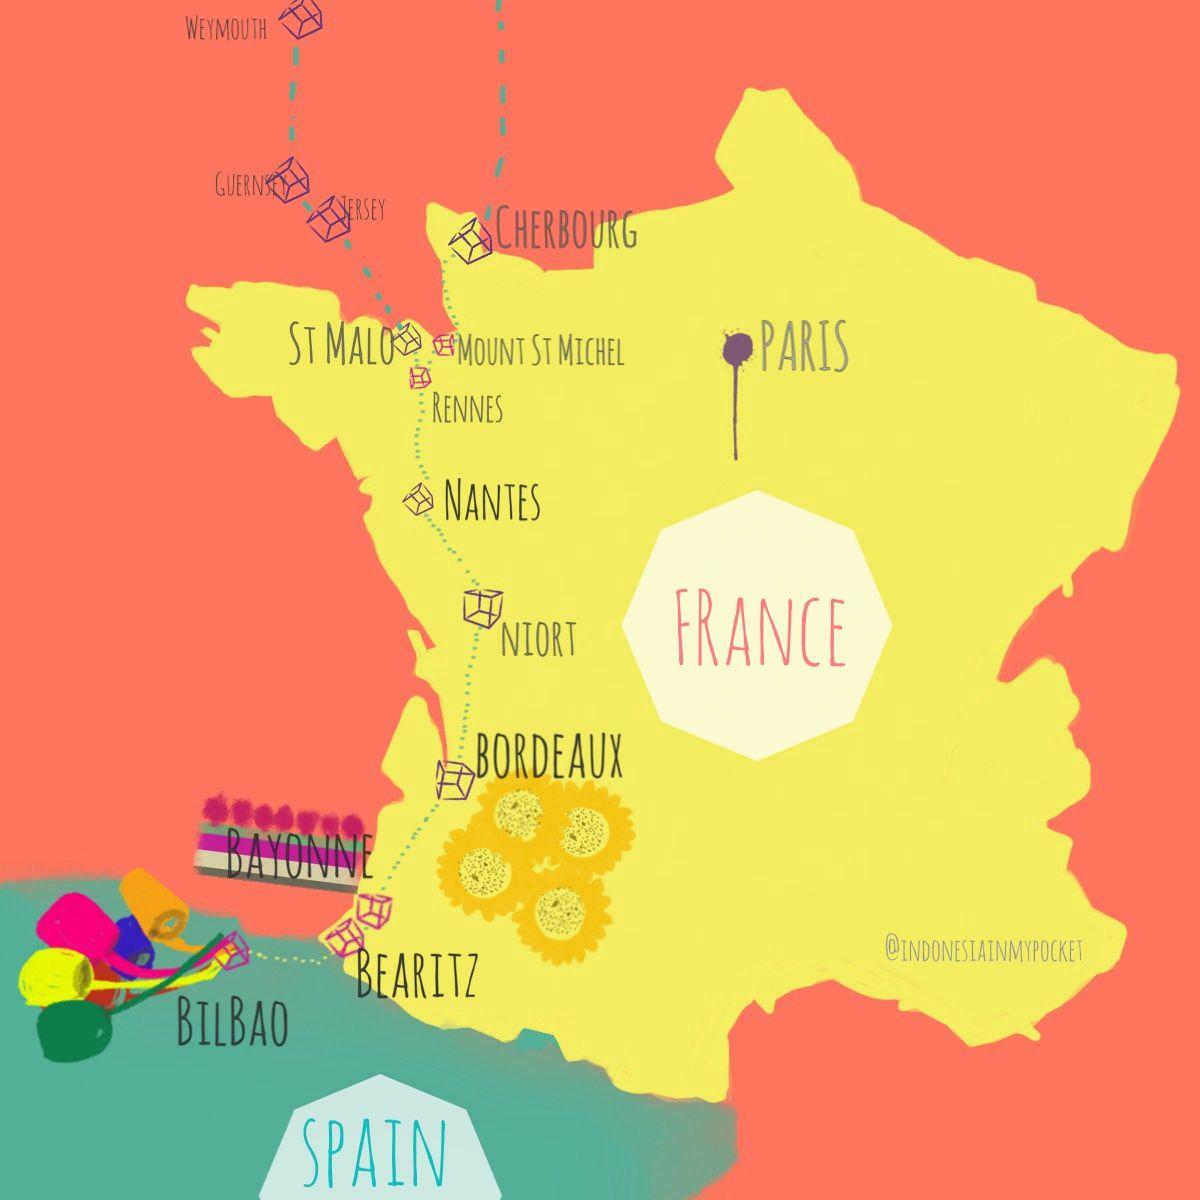 Biaritz Bastille day and Bayonne France Bastille France and